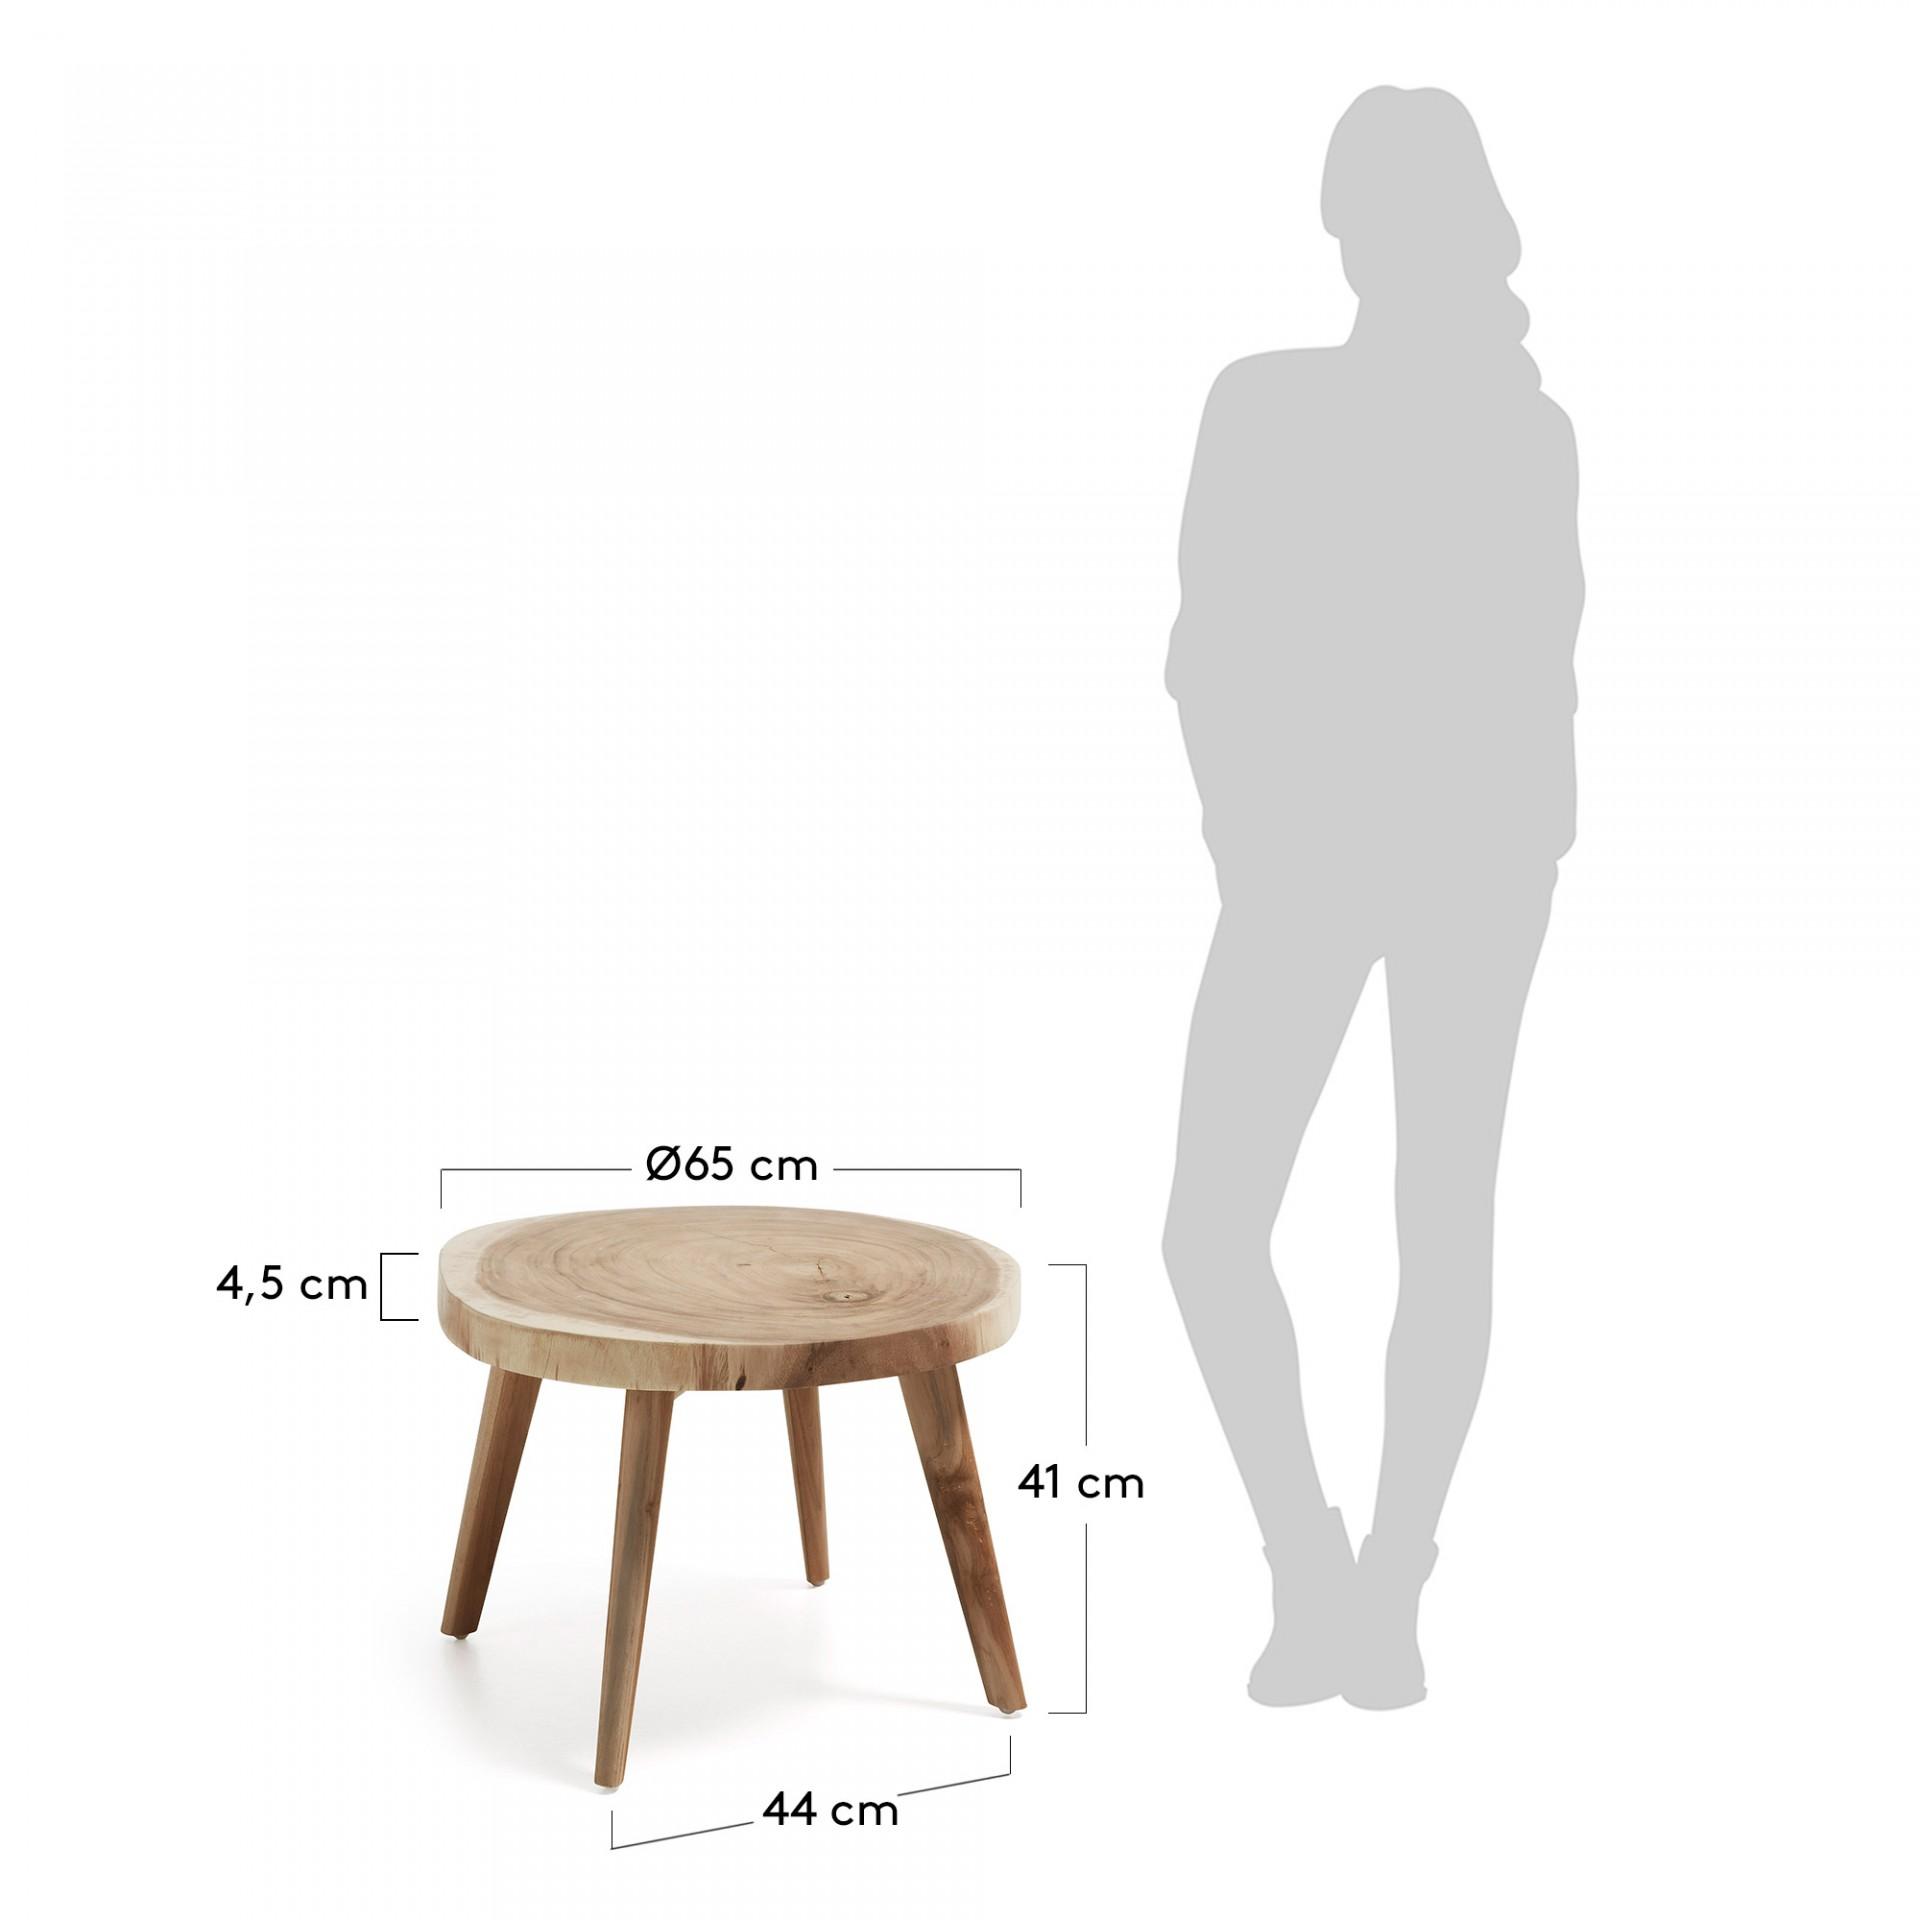 Mesa de centro, madeira Munggur natural, Ø65x41 cm